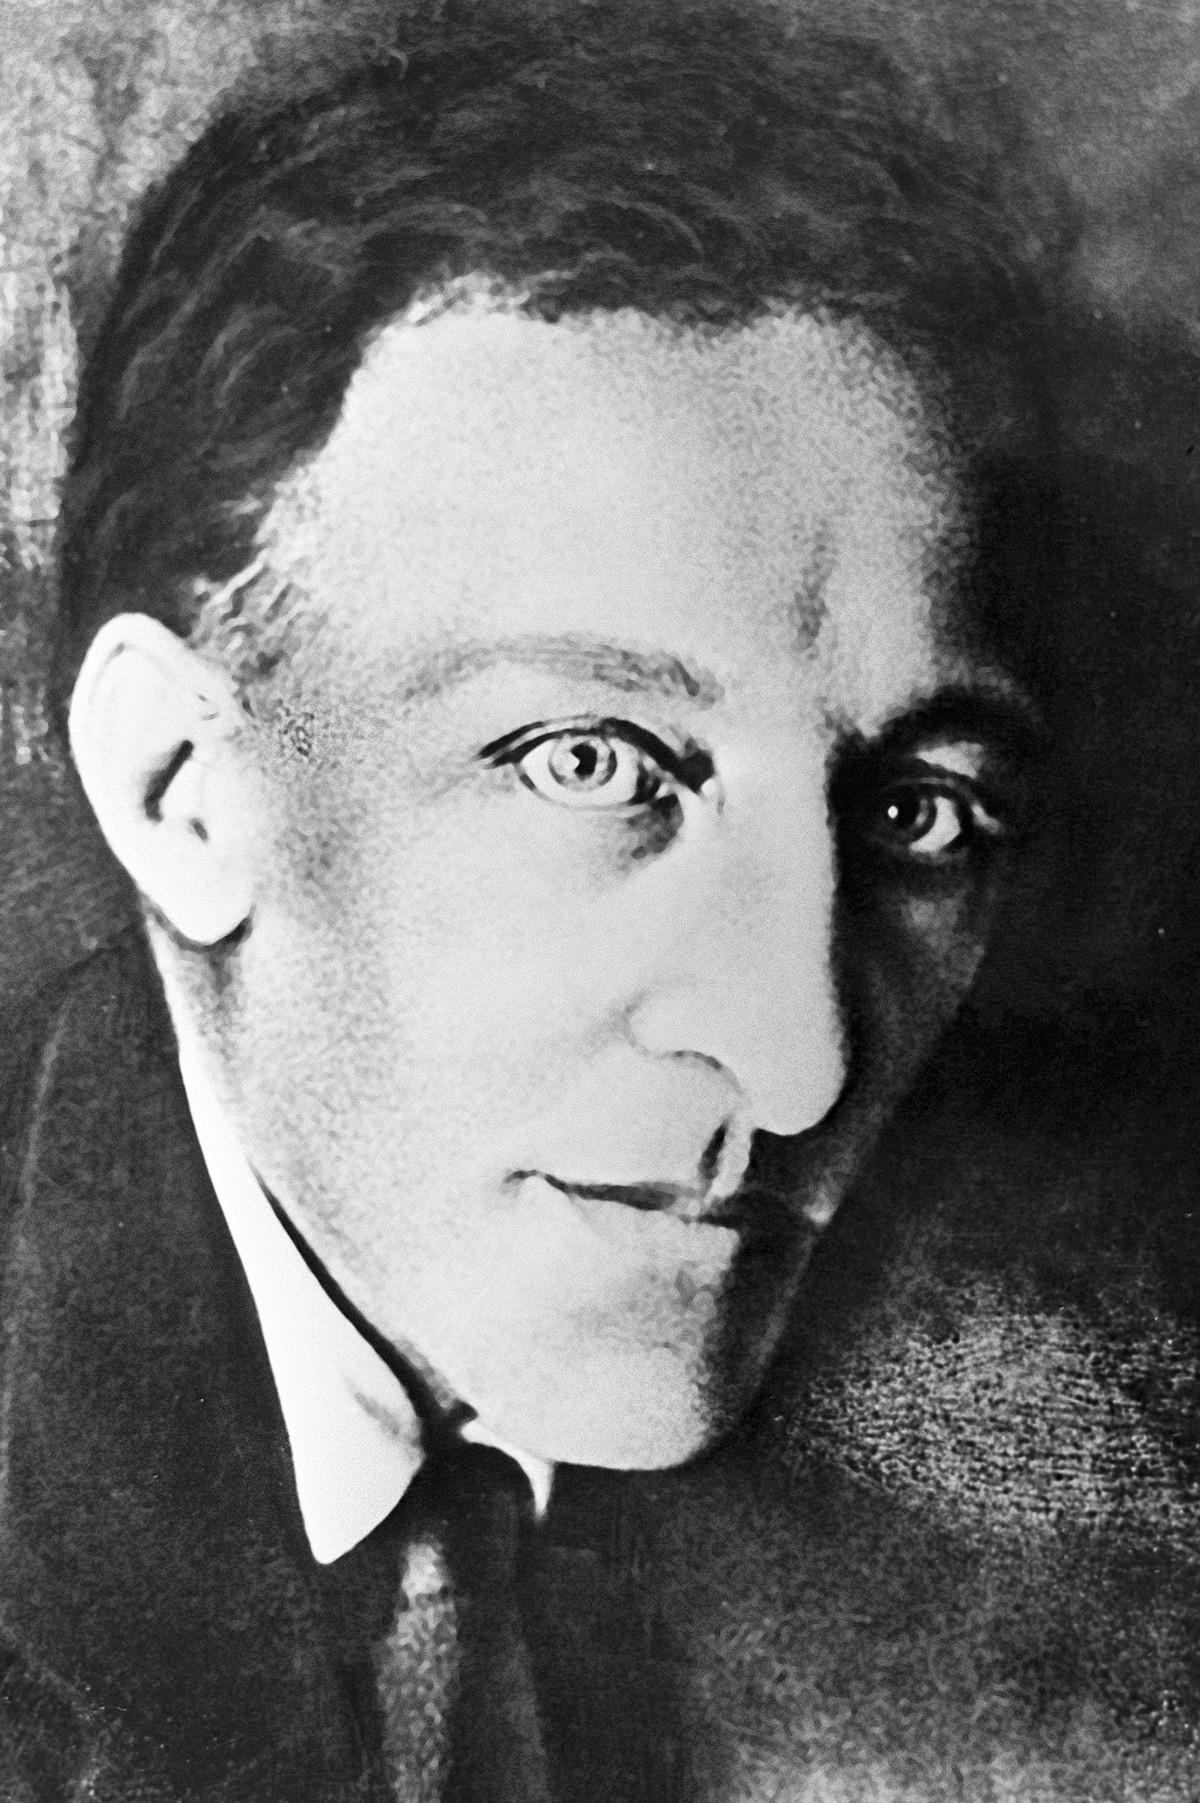 Alexandre Blok en 1920